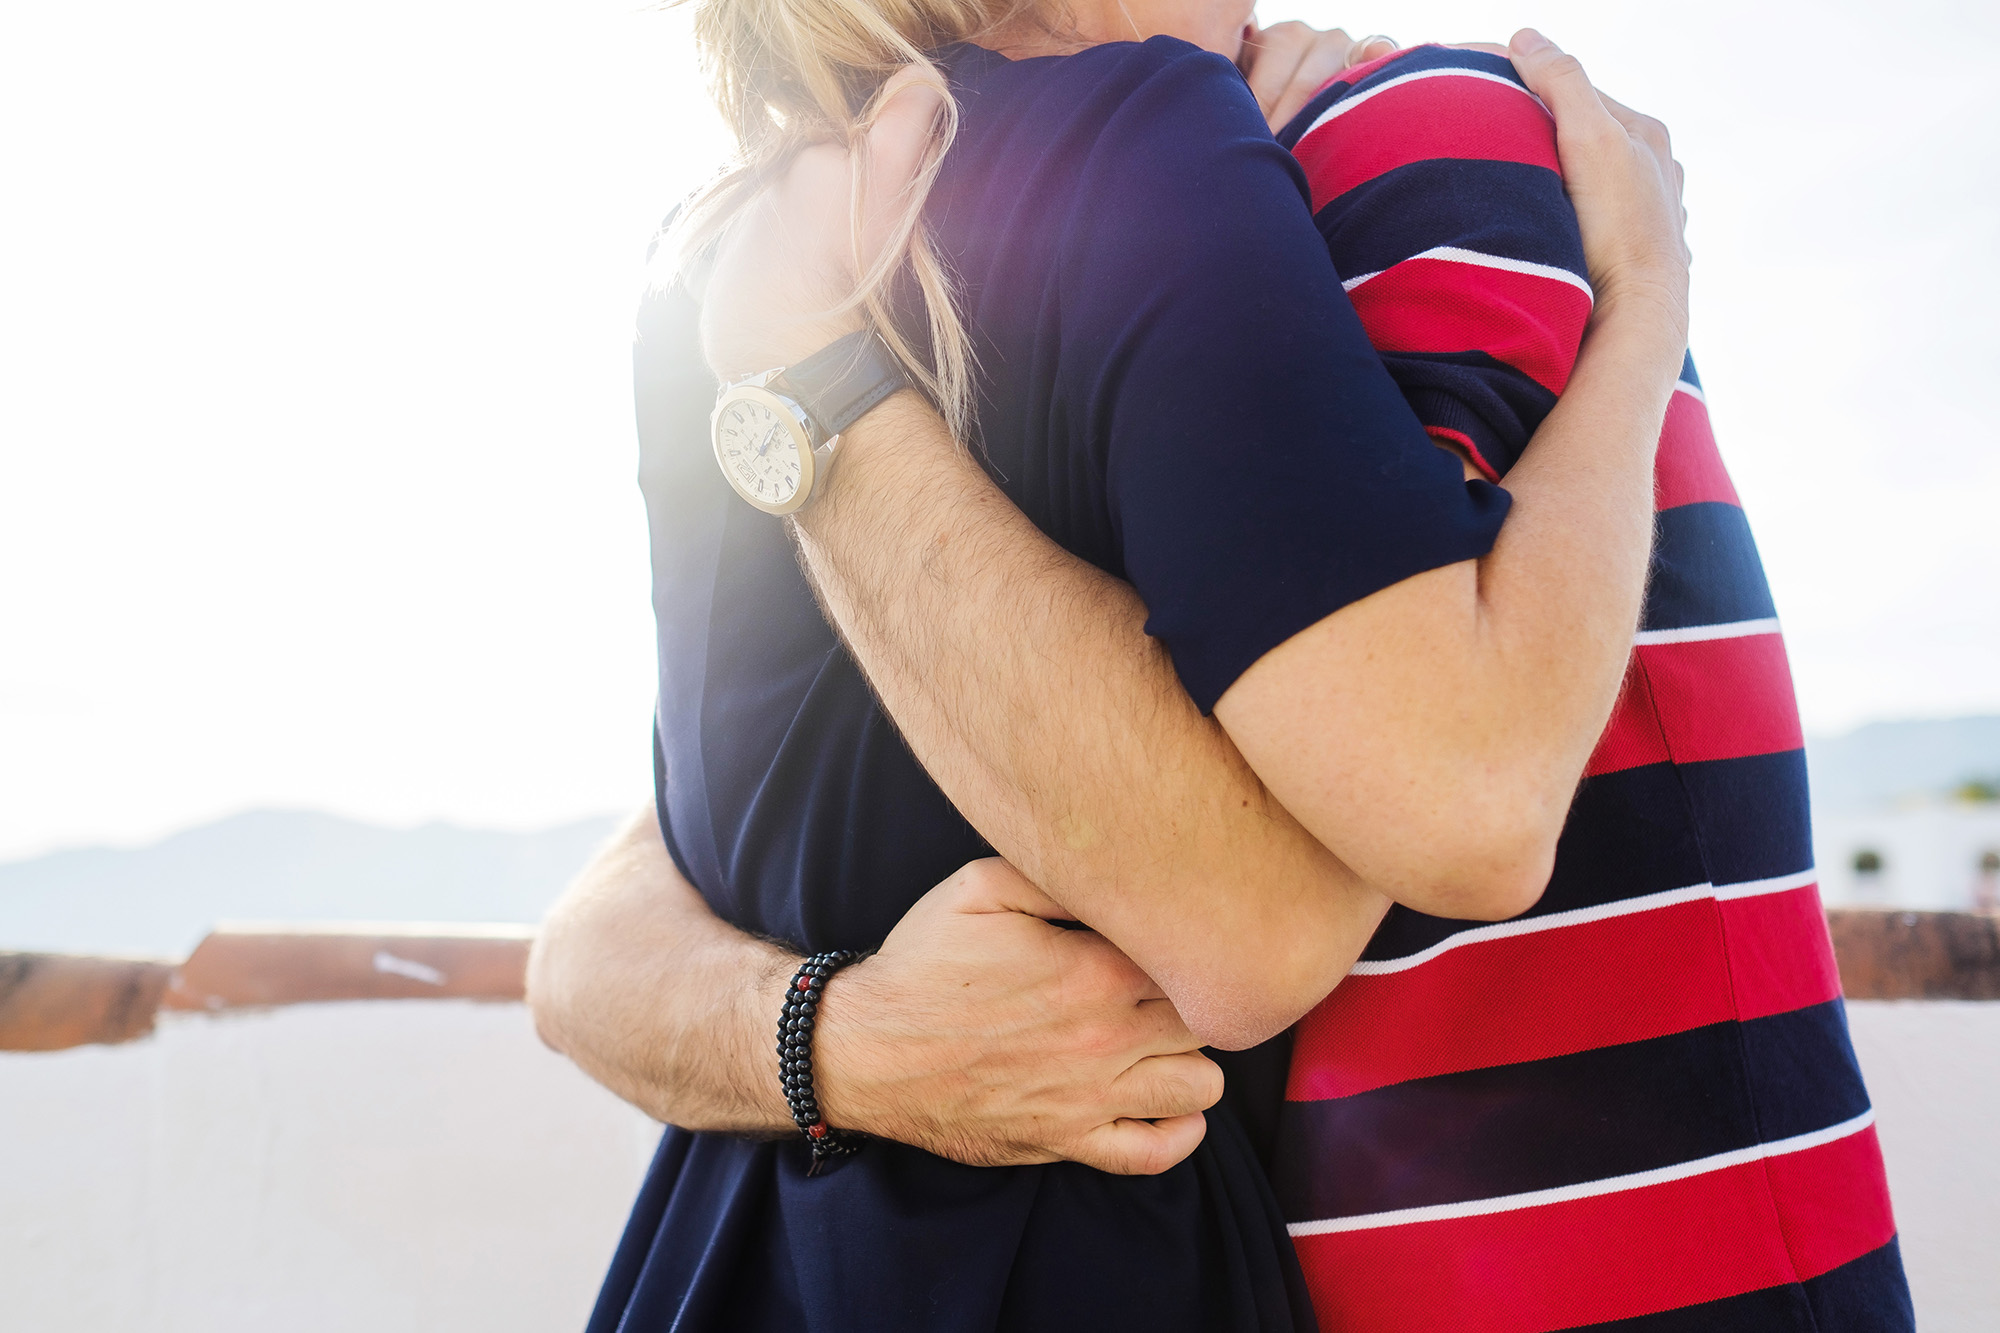 04_couple-embracing-in-sun